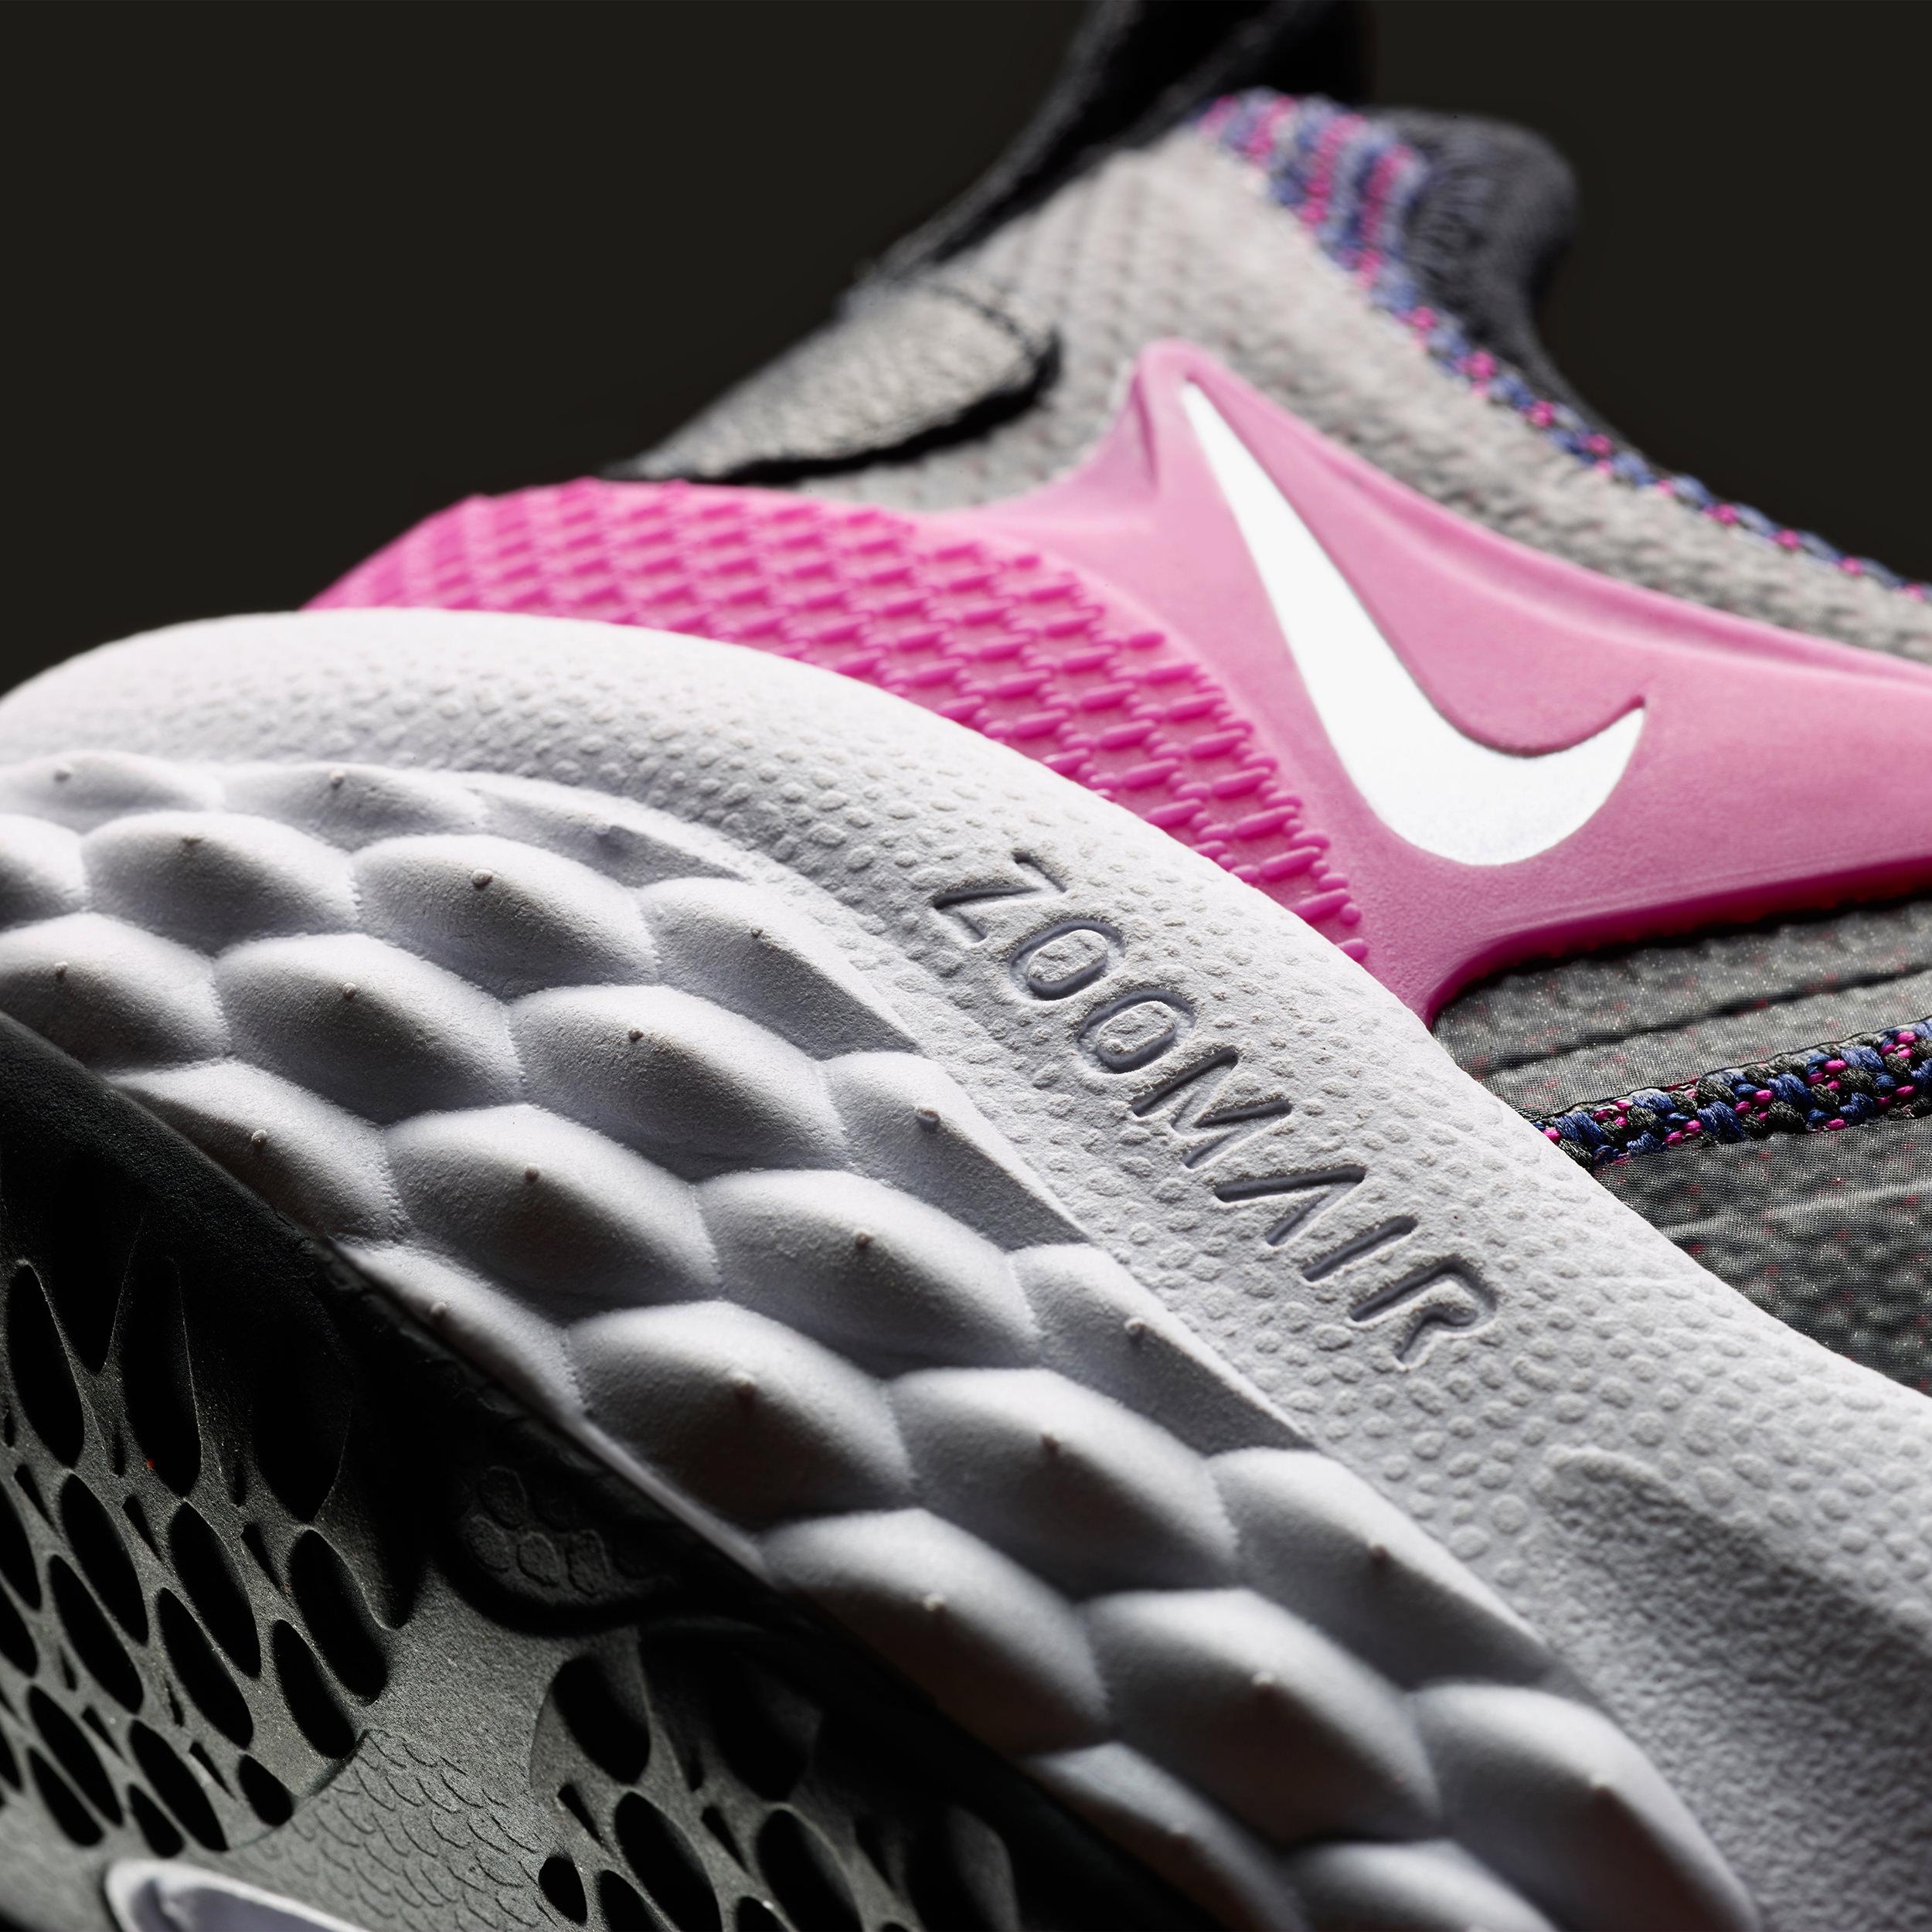 NikeLab x KIM JONES